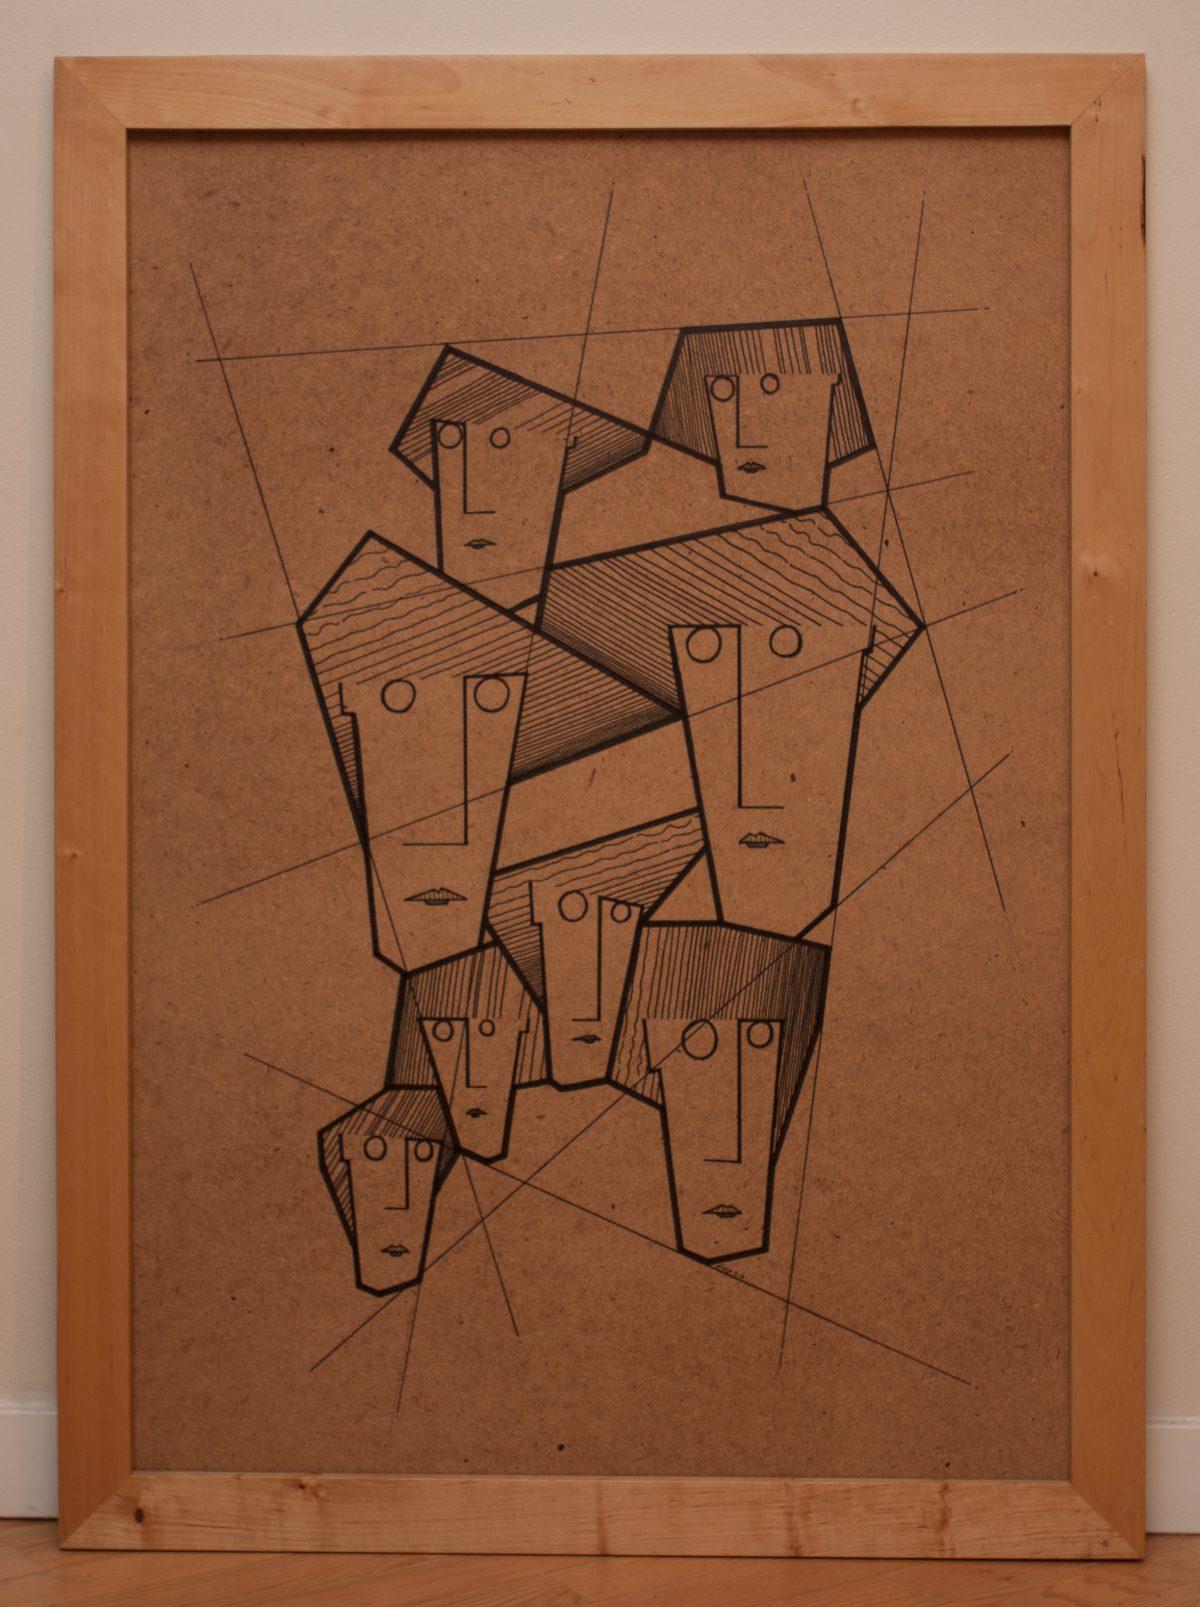 Eight Sisters 2/3 - 70x100cm, pen on fibreboard, ch3, pen, wood, illustration, frame